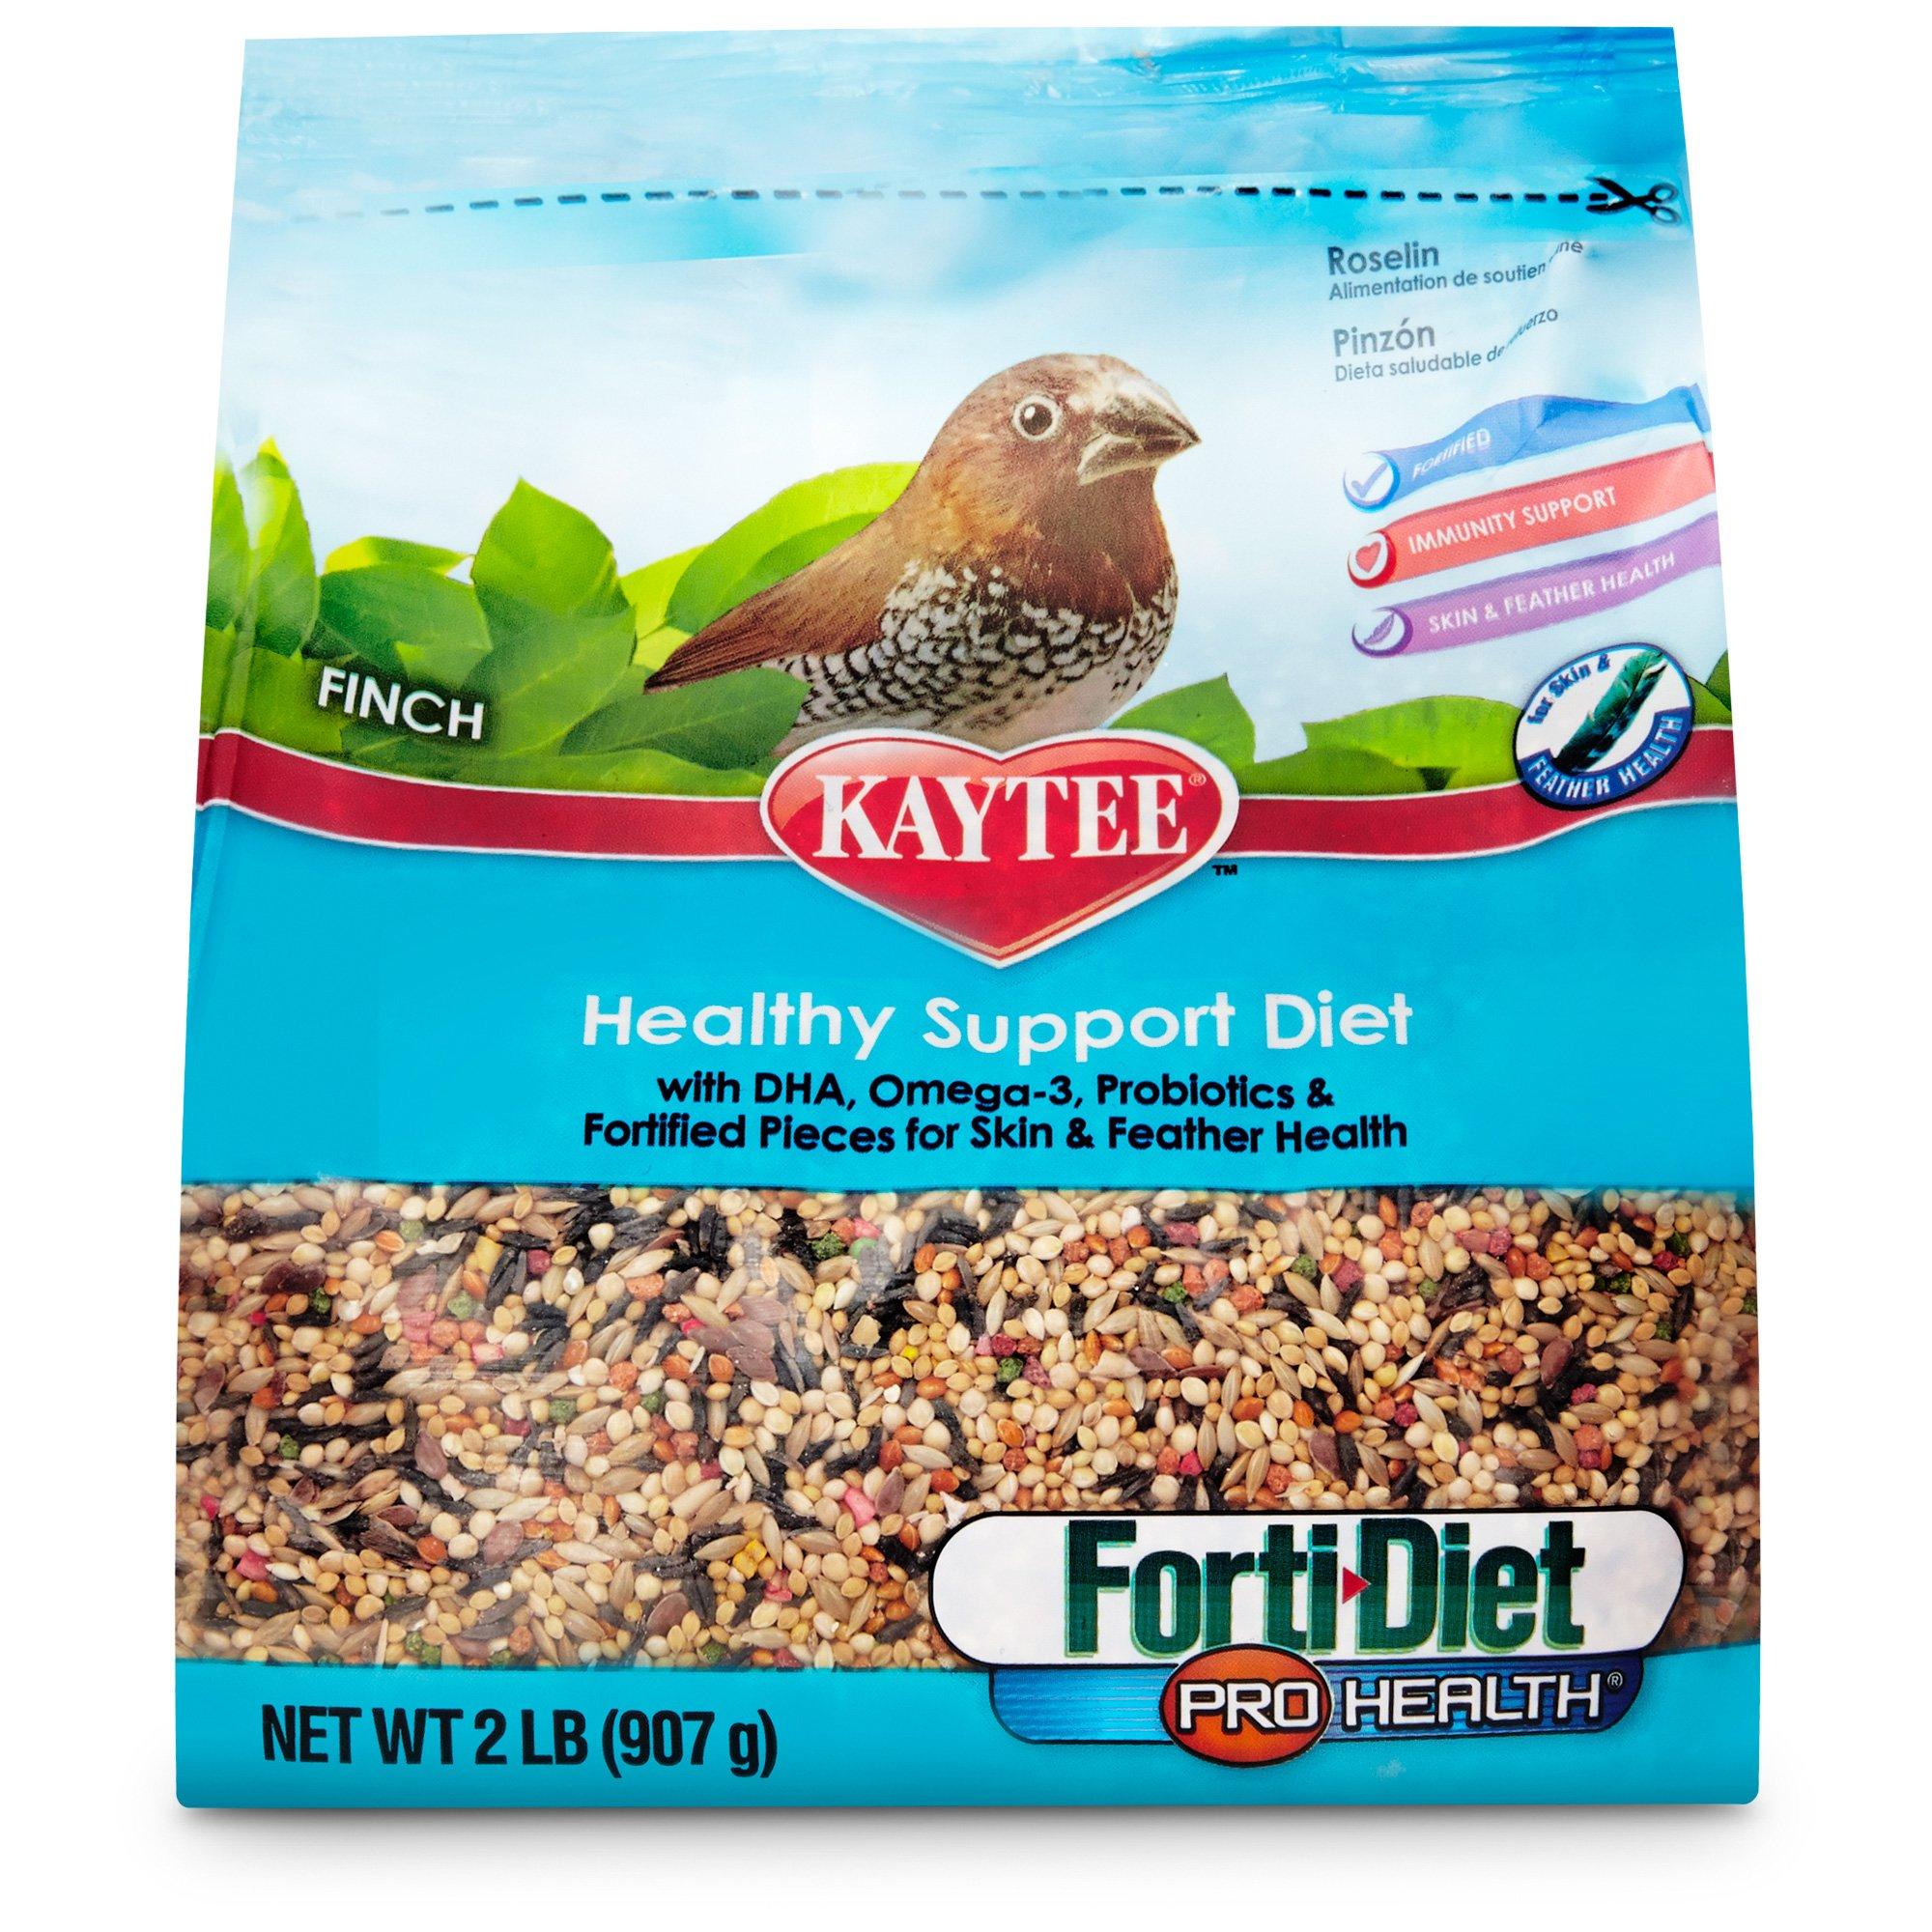 Kaytee Forti-Diet Pro Health Finch Food